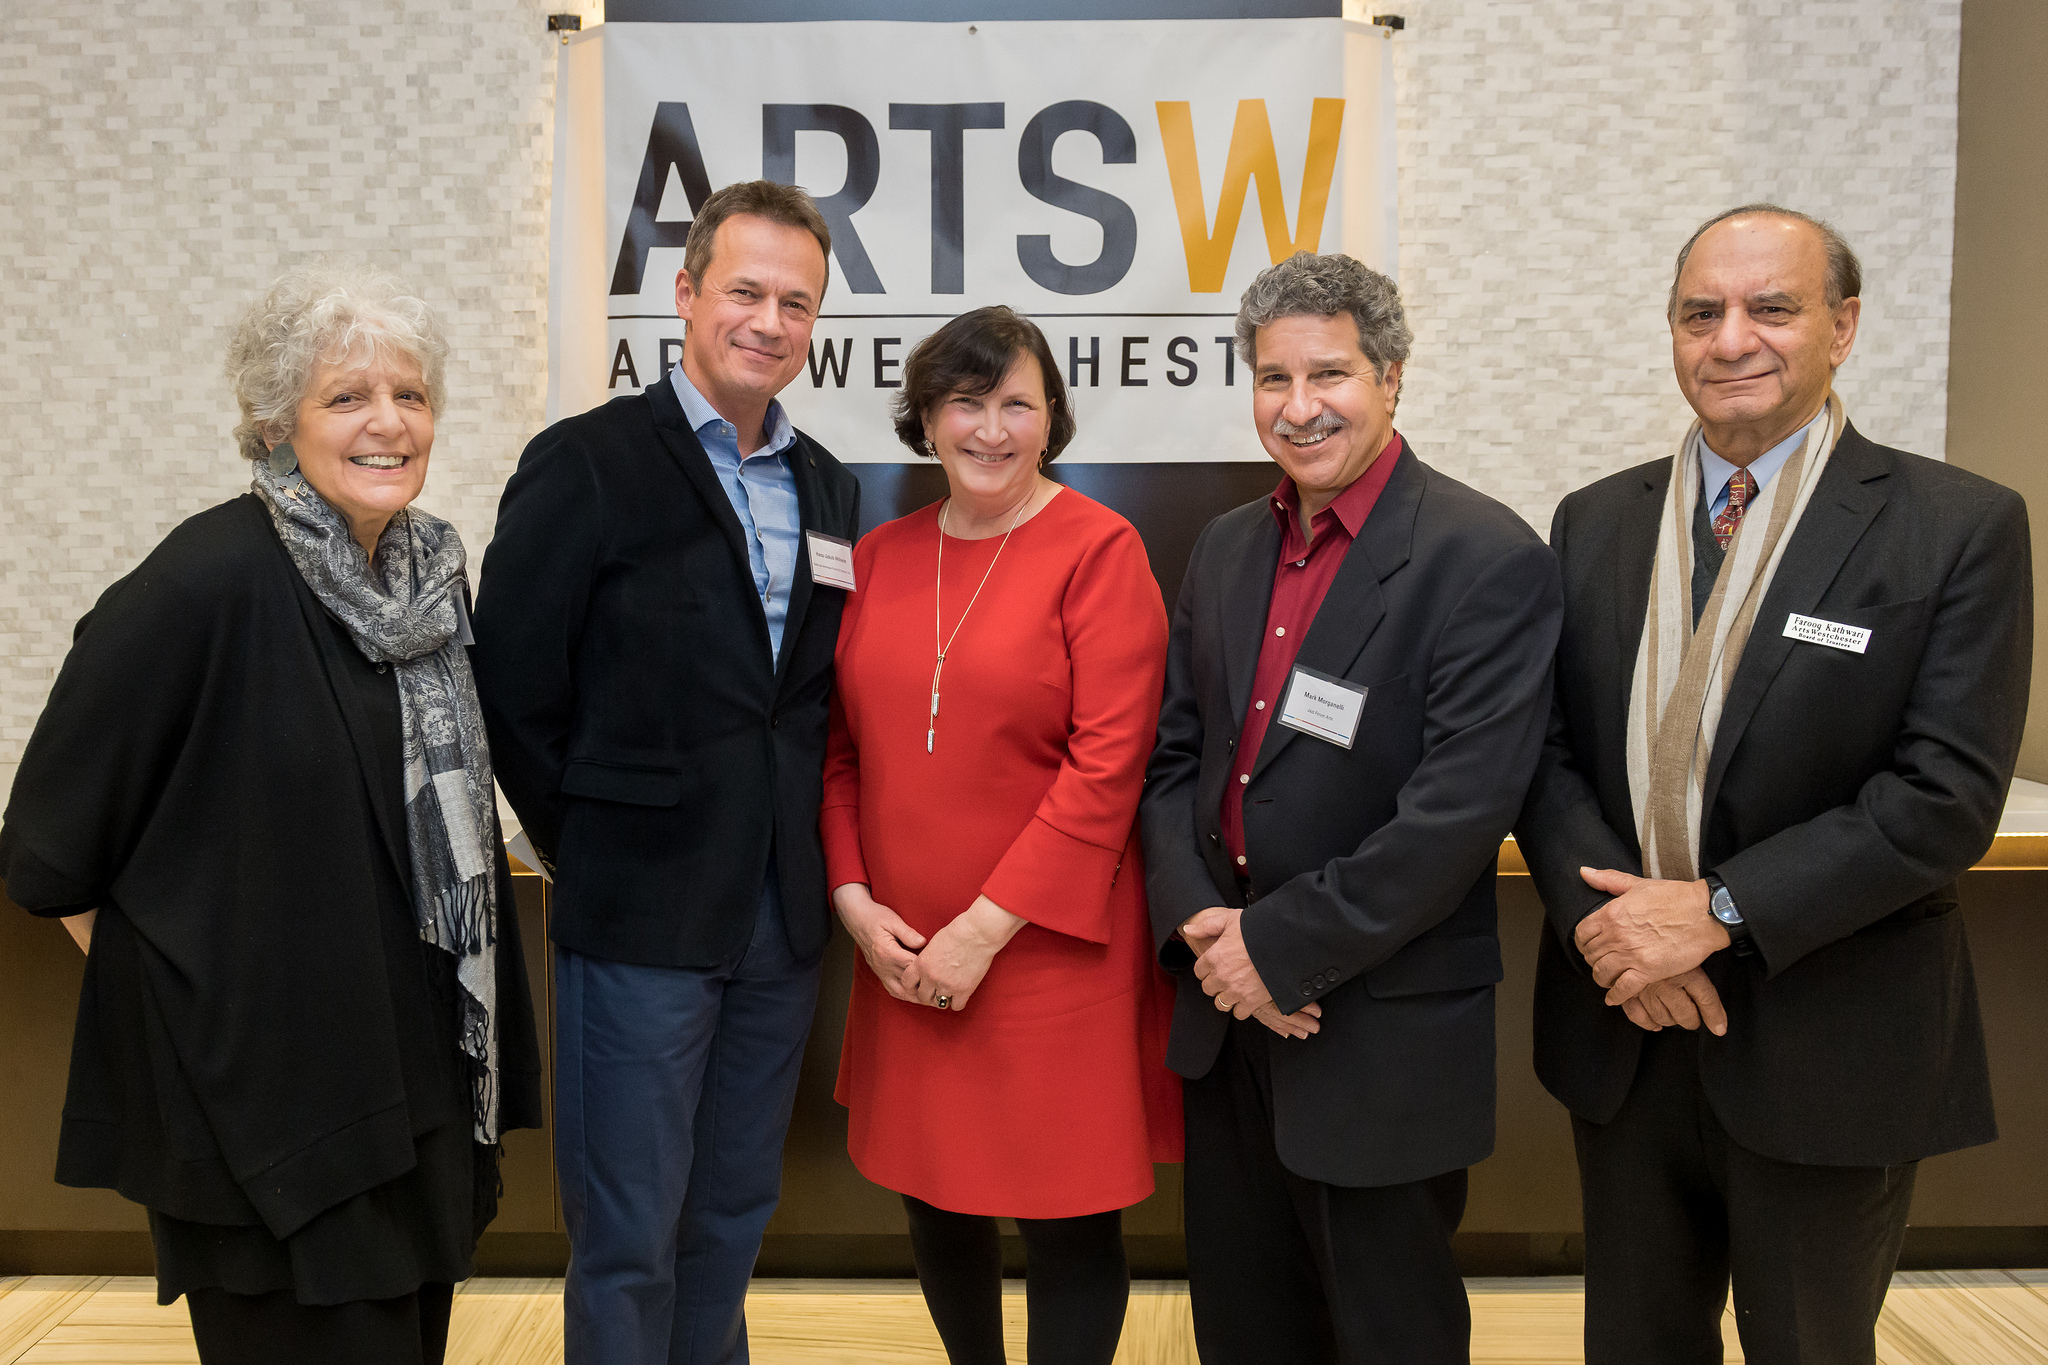 Judith Weber accepting our grant from ArtsWestchester. LtoR: Judith Weber, Hans-Jakob Wilhelm (Director, Ballet de Ameriques), Nancy Barr (Legislator for District 6), Farooq Kathwari (President, Ethan Allen & ArtsWestchester Board Member)